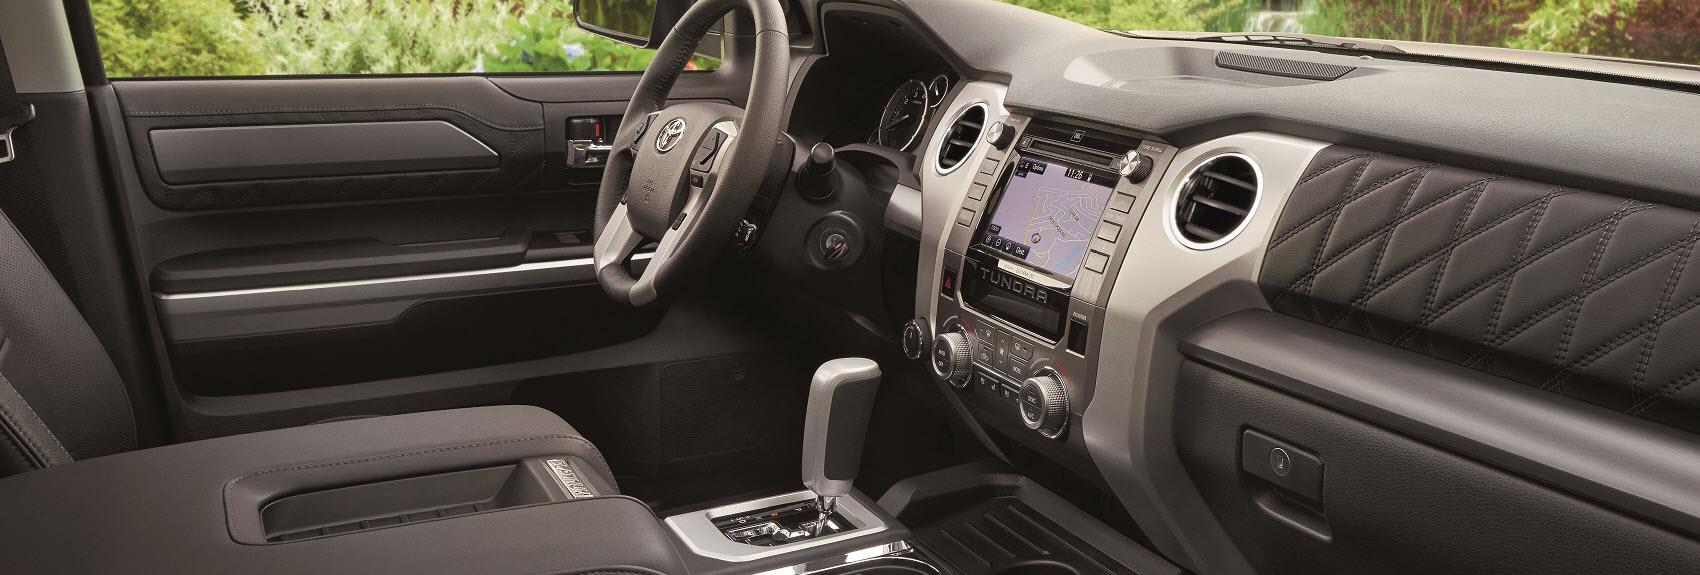 2019 Toyota Tundra Interior